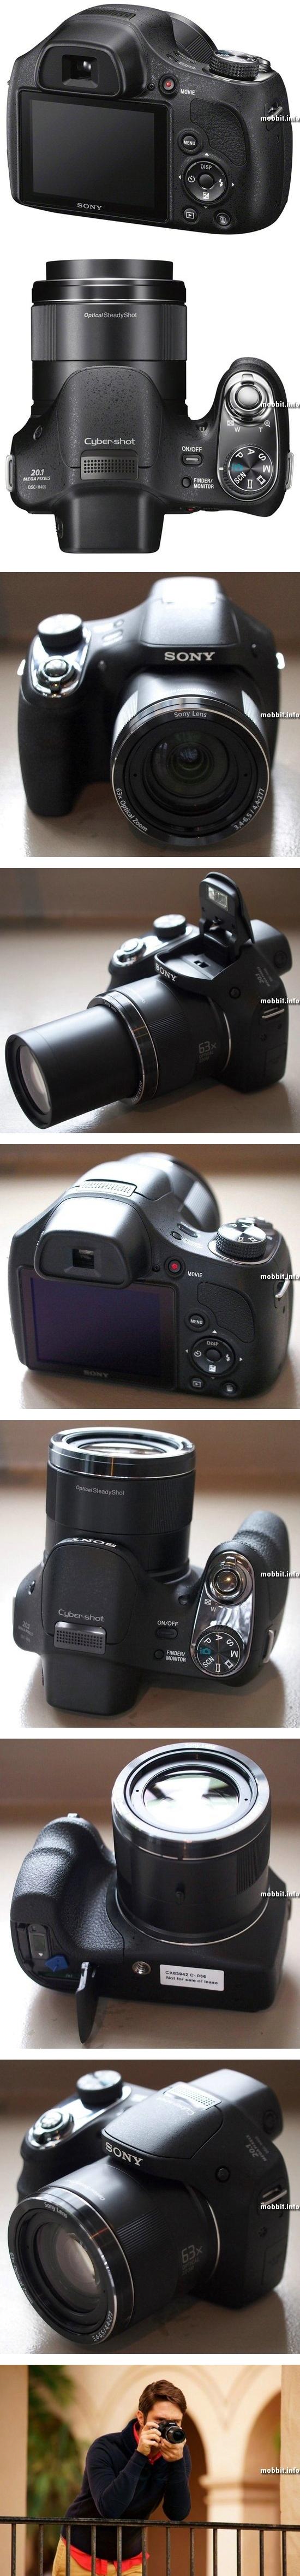 Cyber-shot H400